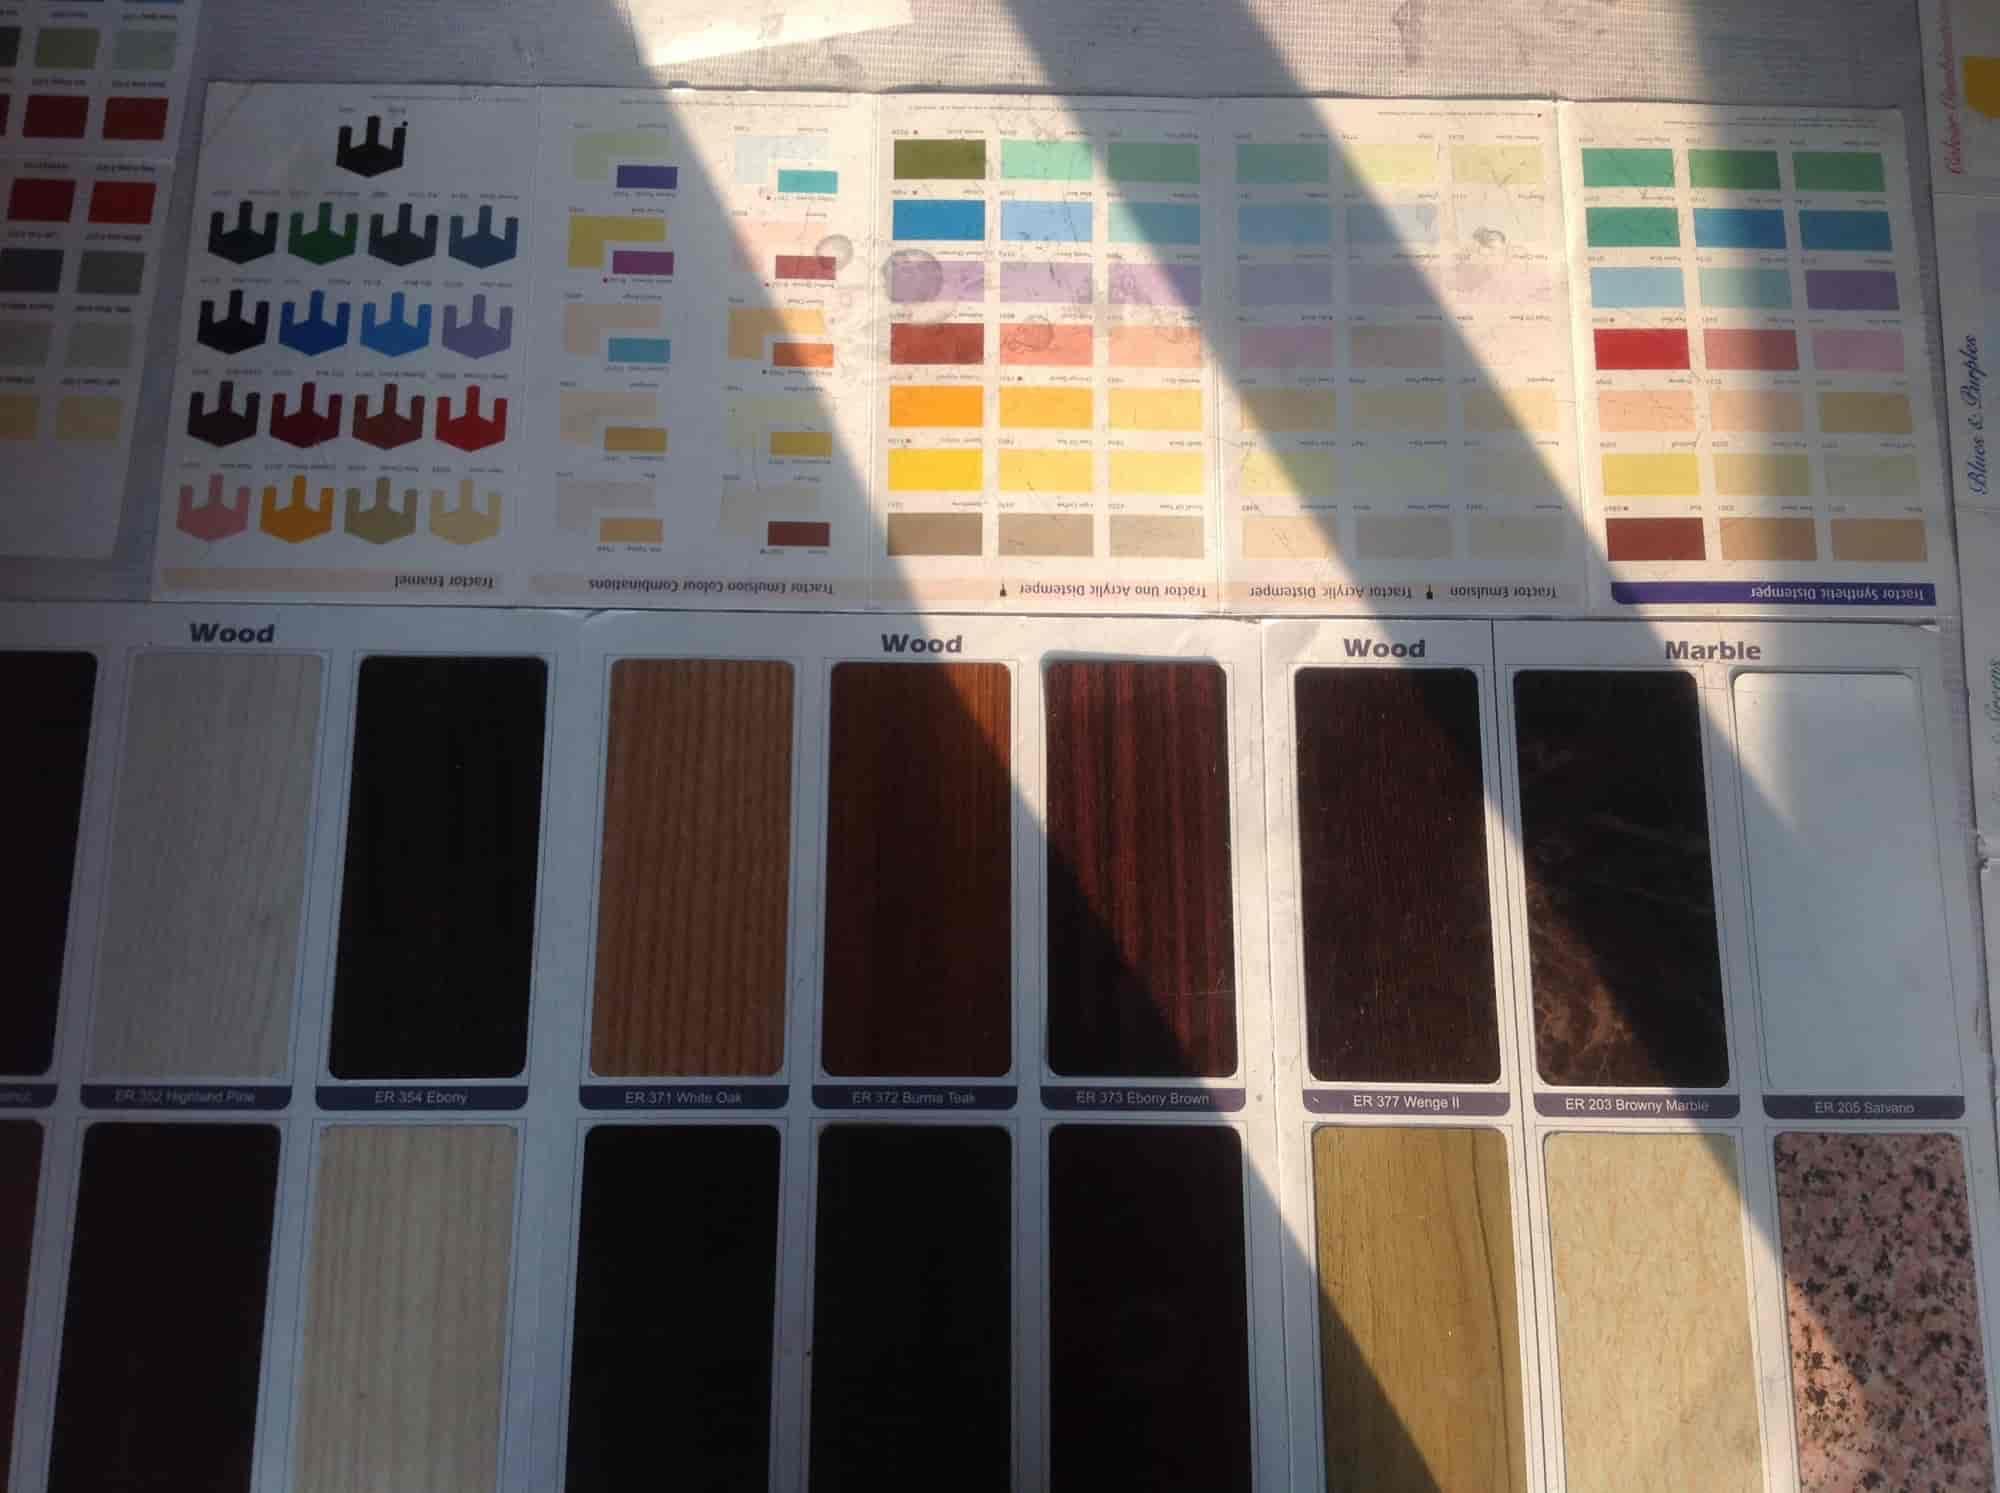 S K Gupta Paints Malad West Paint Dealers Asian Paints In Mumbai Justdial